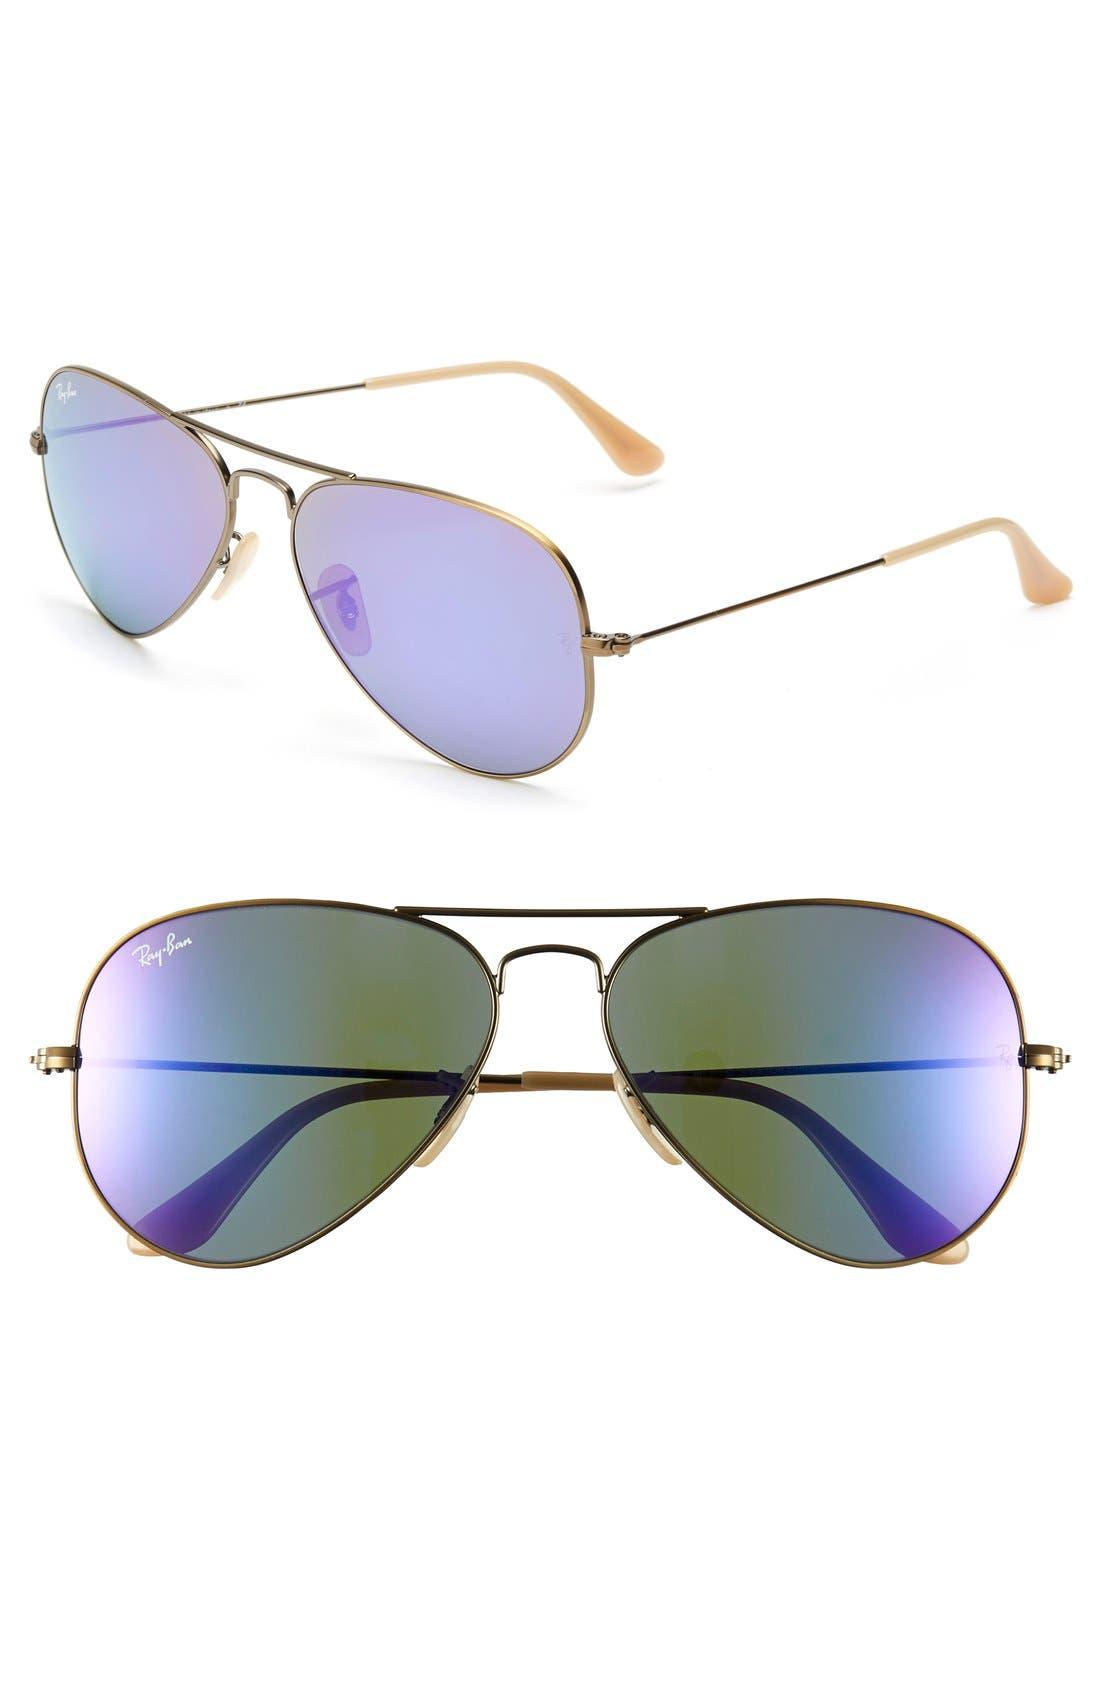 Main Image - Ray-Ban Standard Original 58mm Aviator Sunglasses